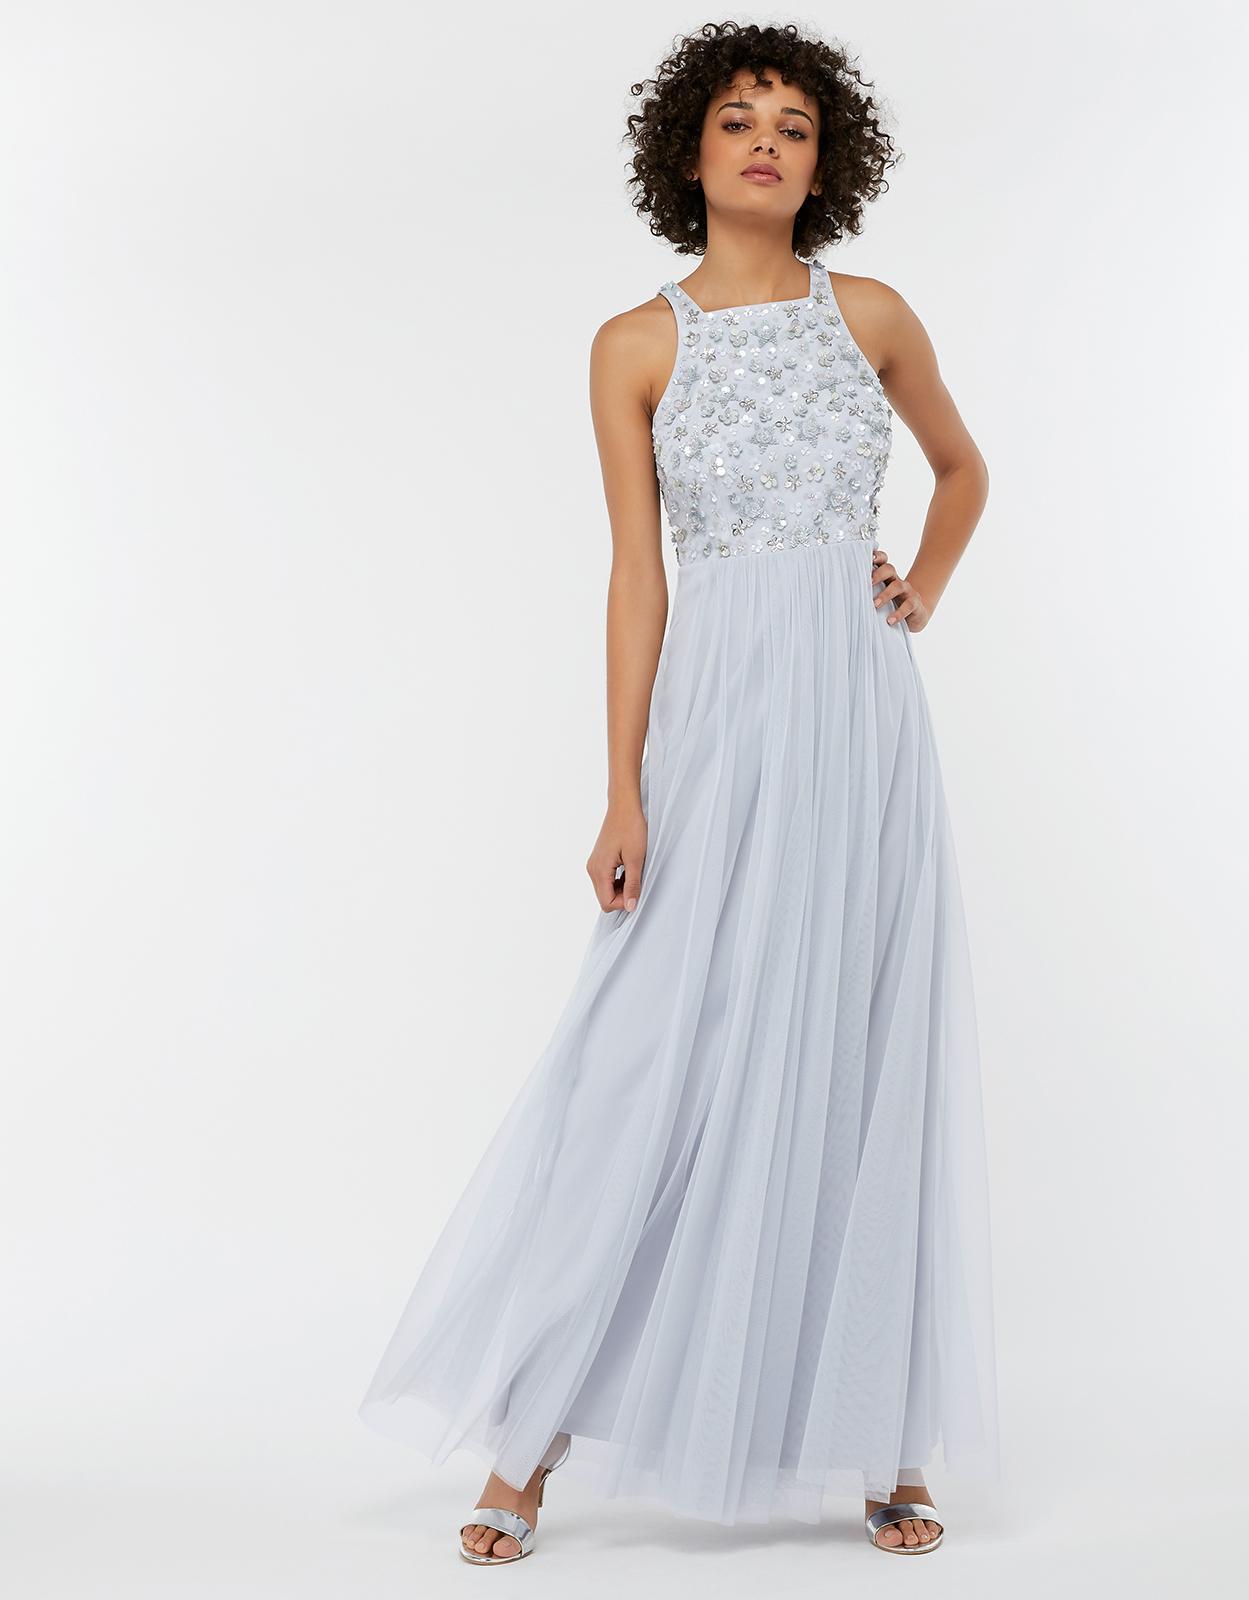 ffaa2843 Monsoon. Women's Blue Constance Sequin Embellished Maxi Bridesmaid Dress